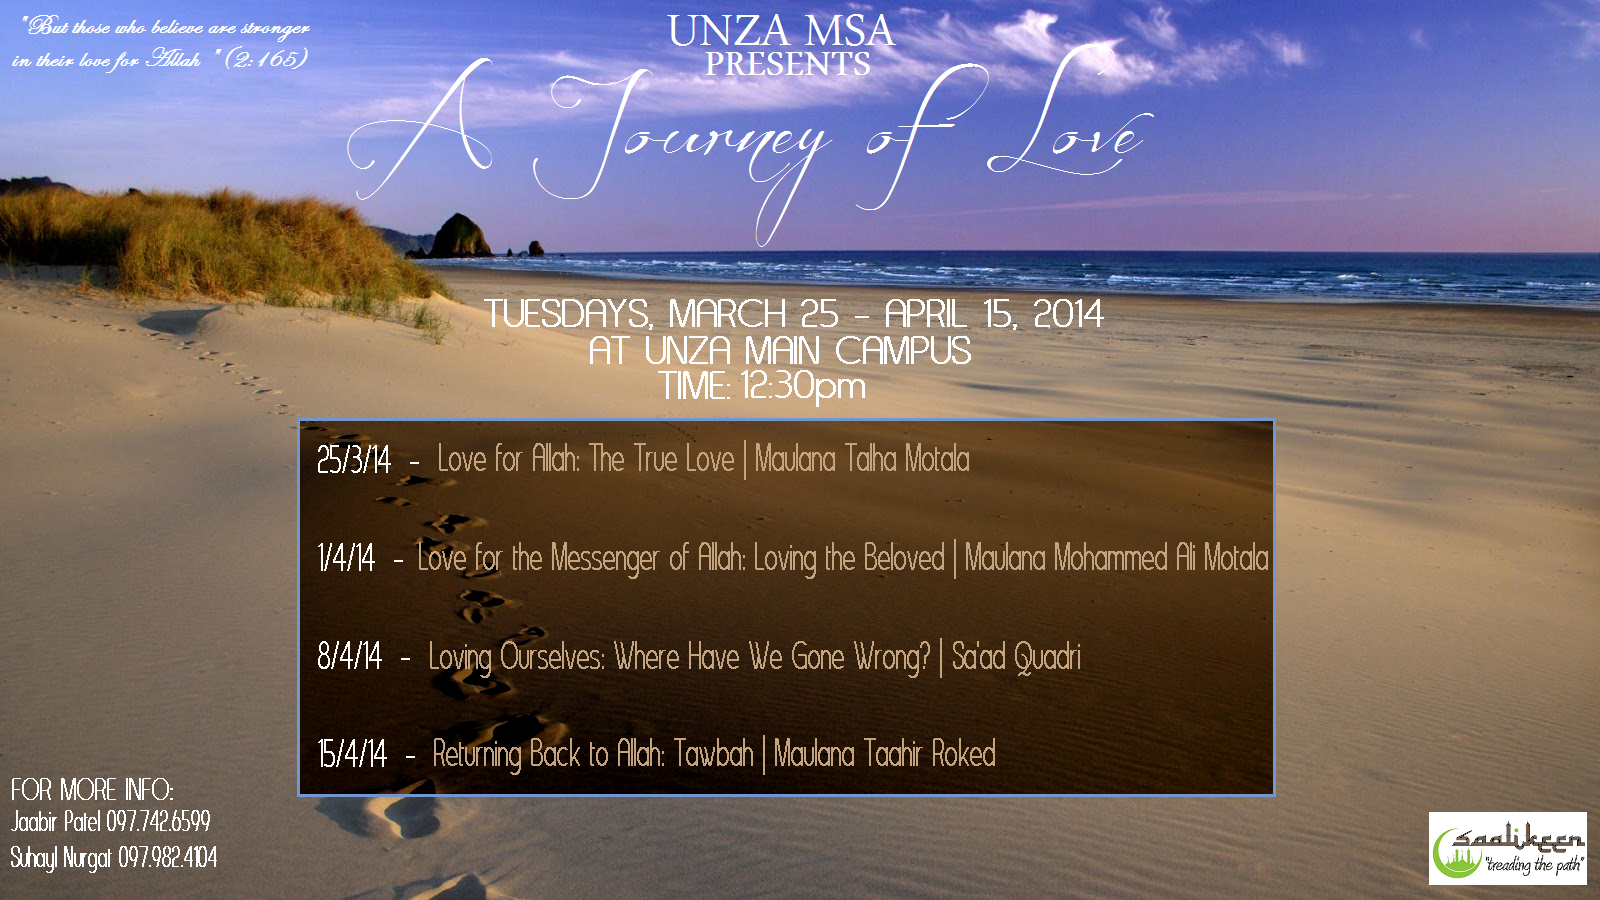 UNZA Flyer